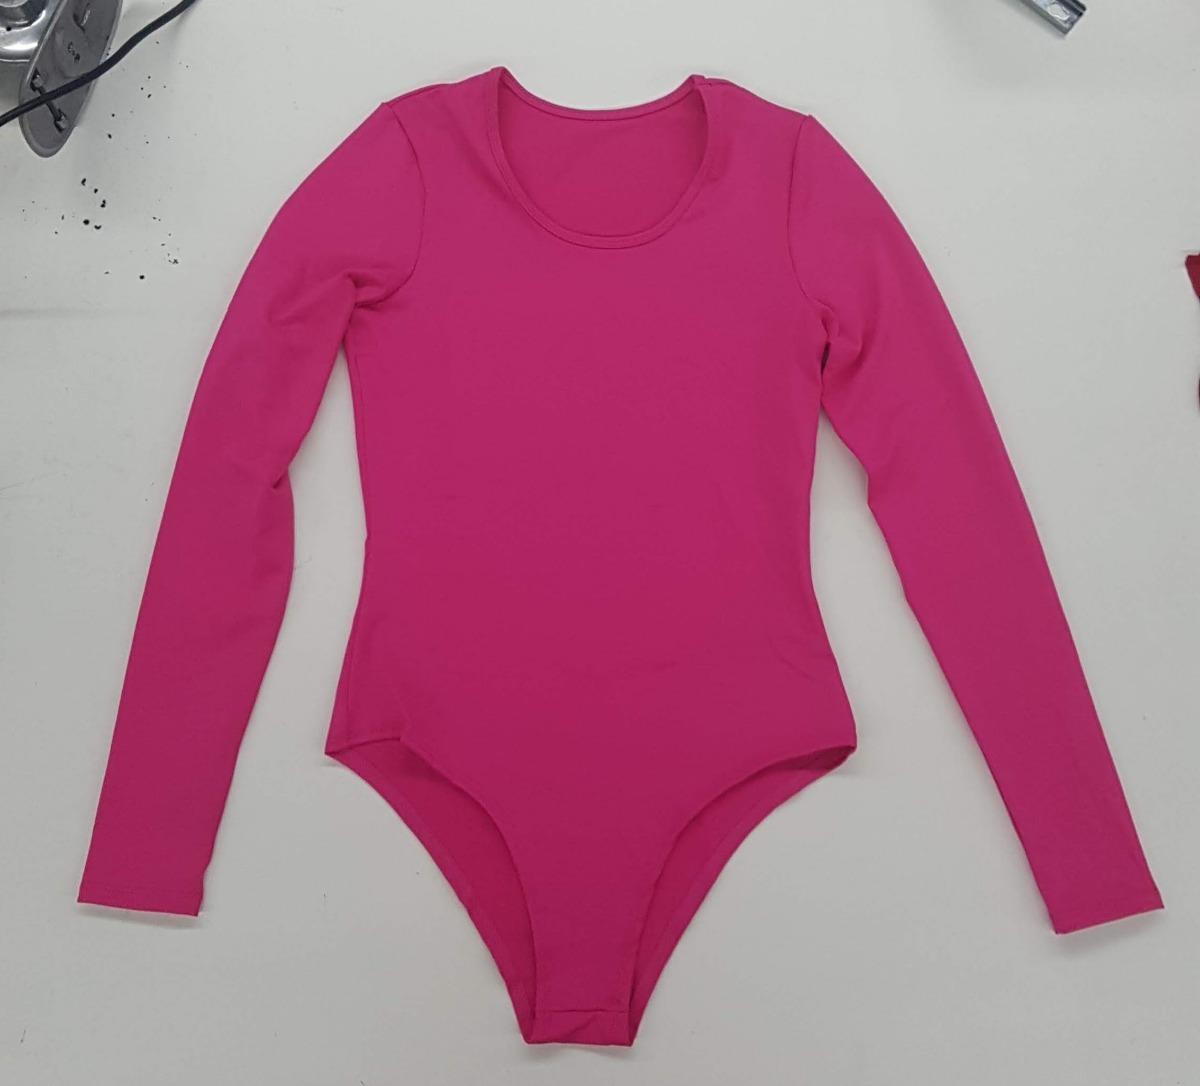 3e227cf75 kit 5 body feminino manga longa costa fechada inverno 040. Carregando zoom.